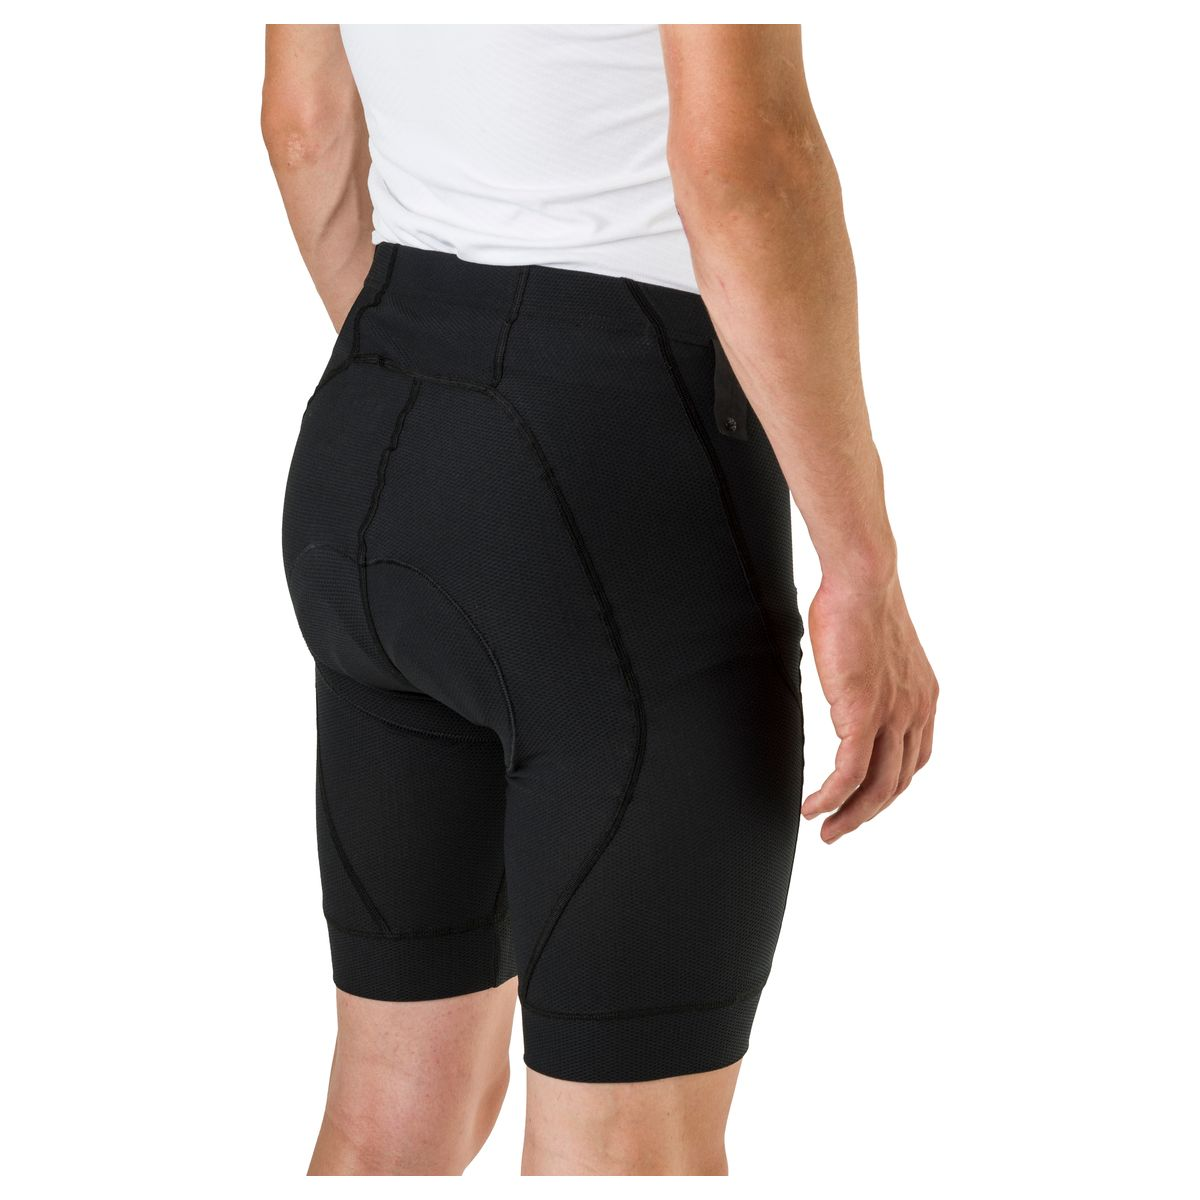 Liner Short MTB Men fit example